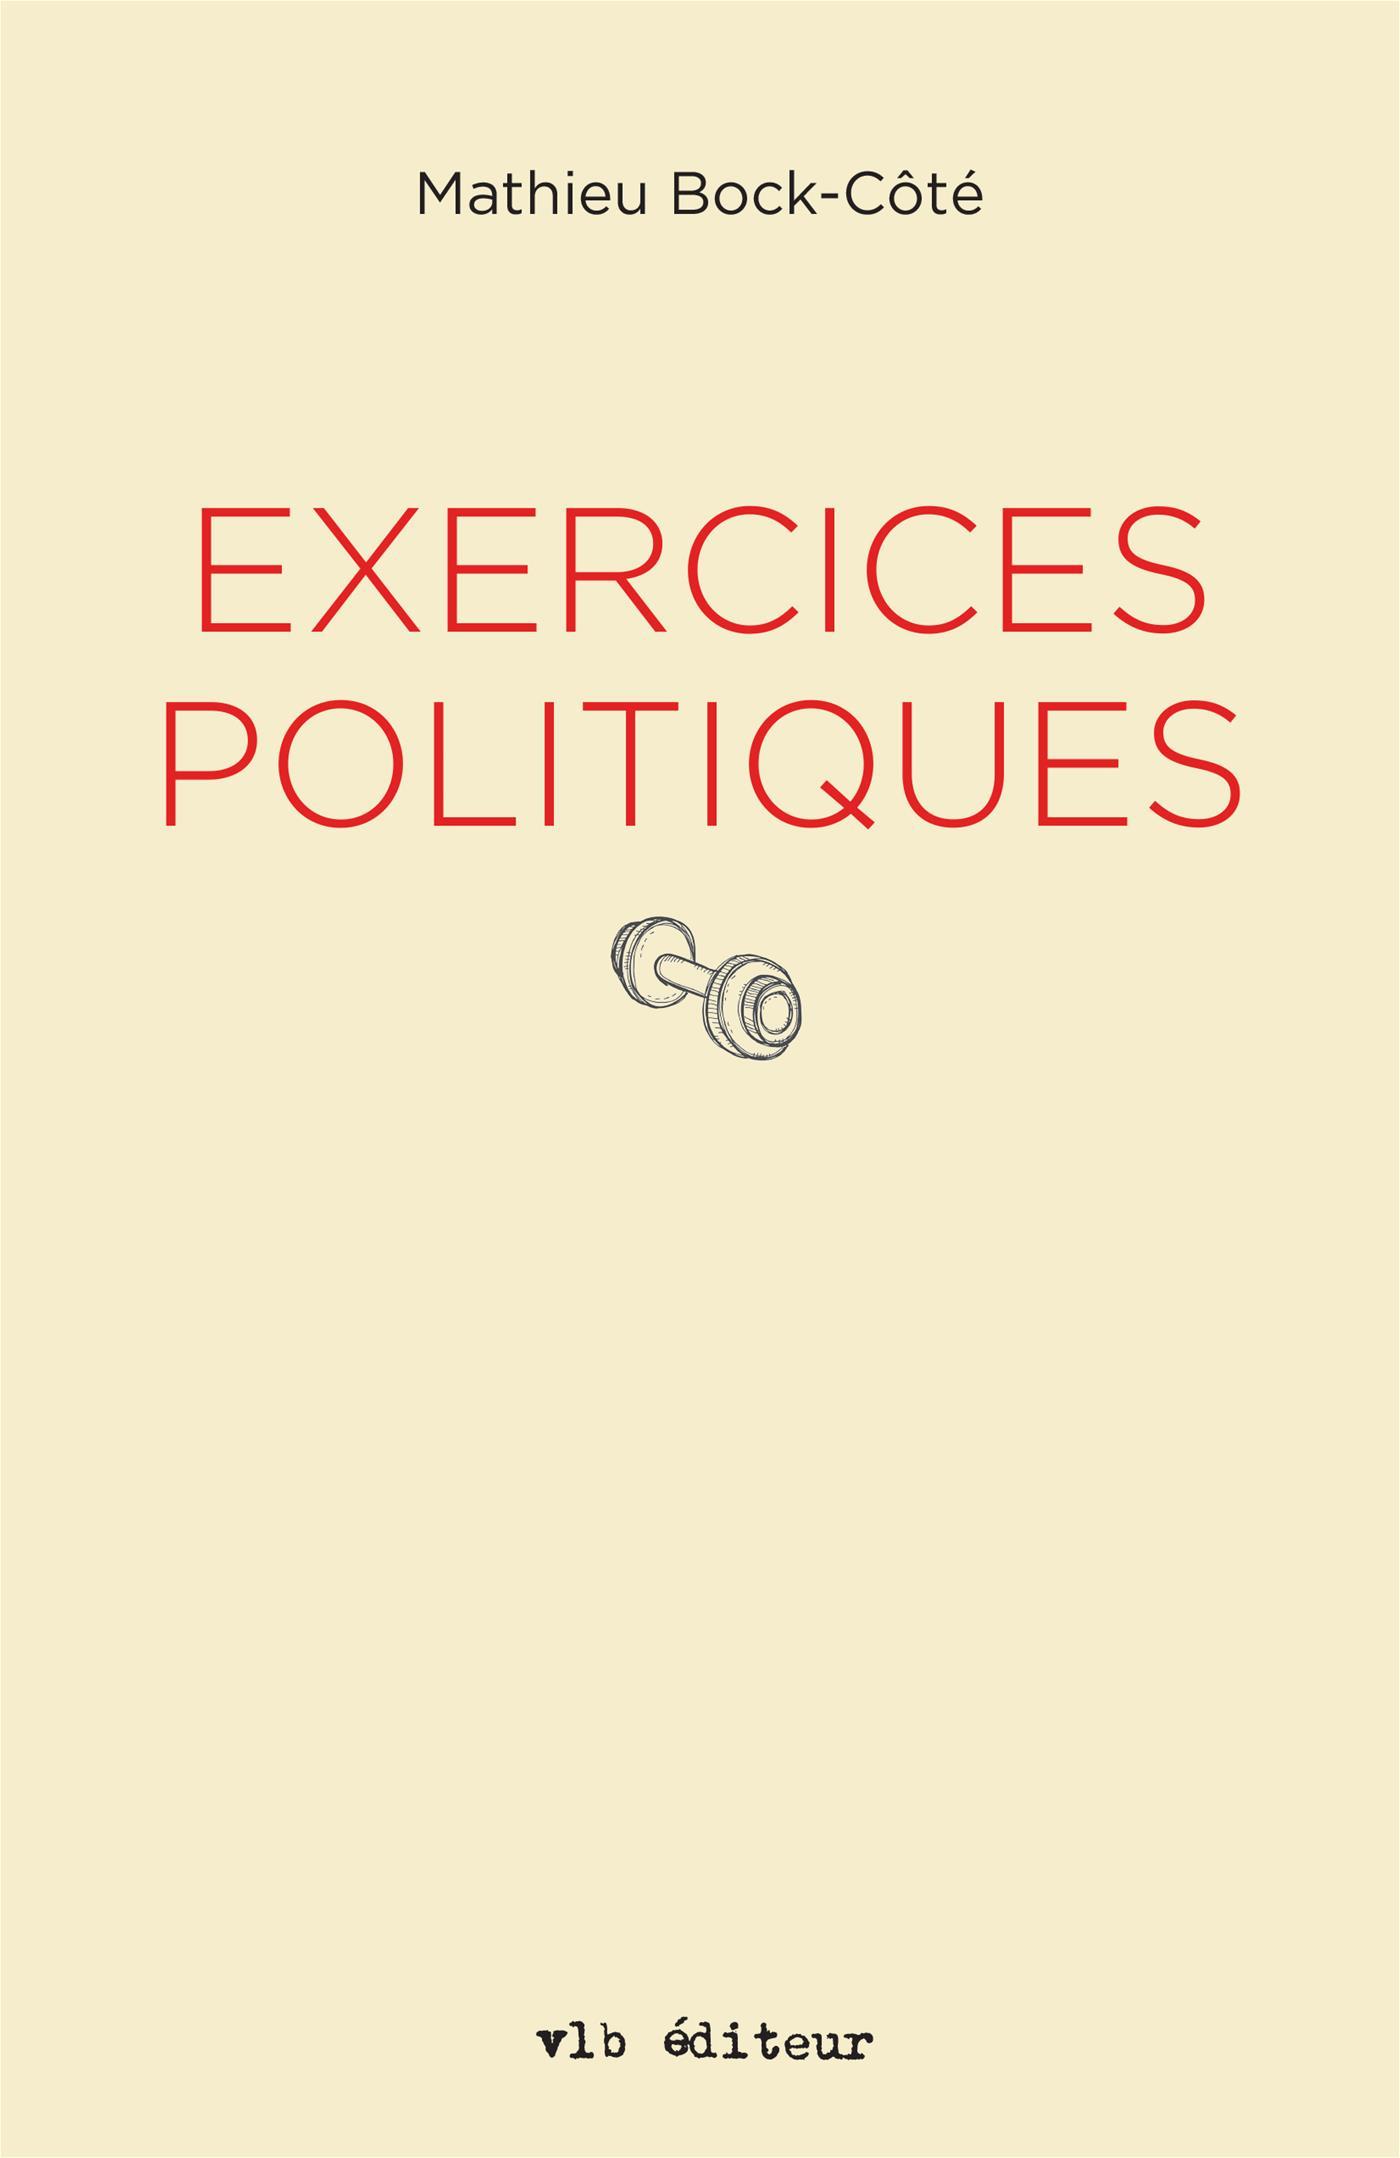 Exercices politiques